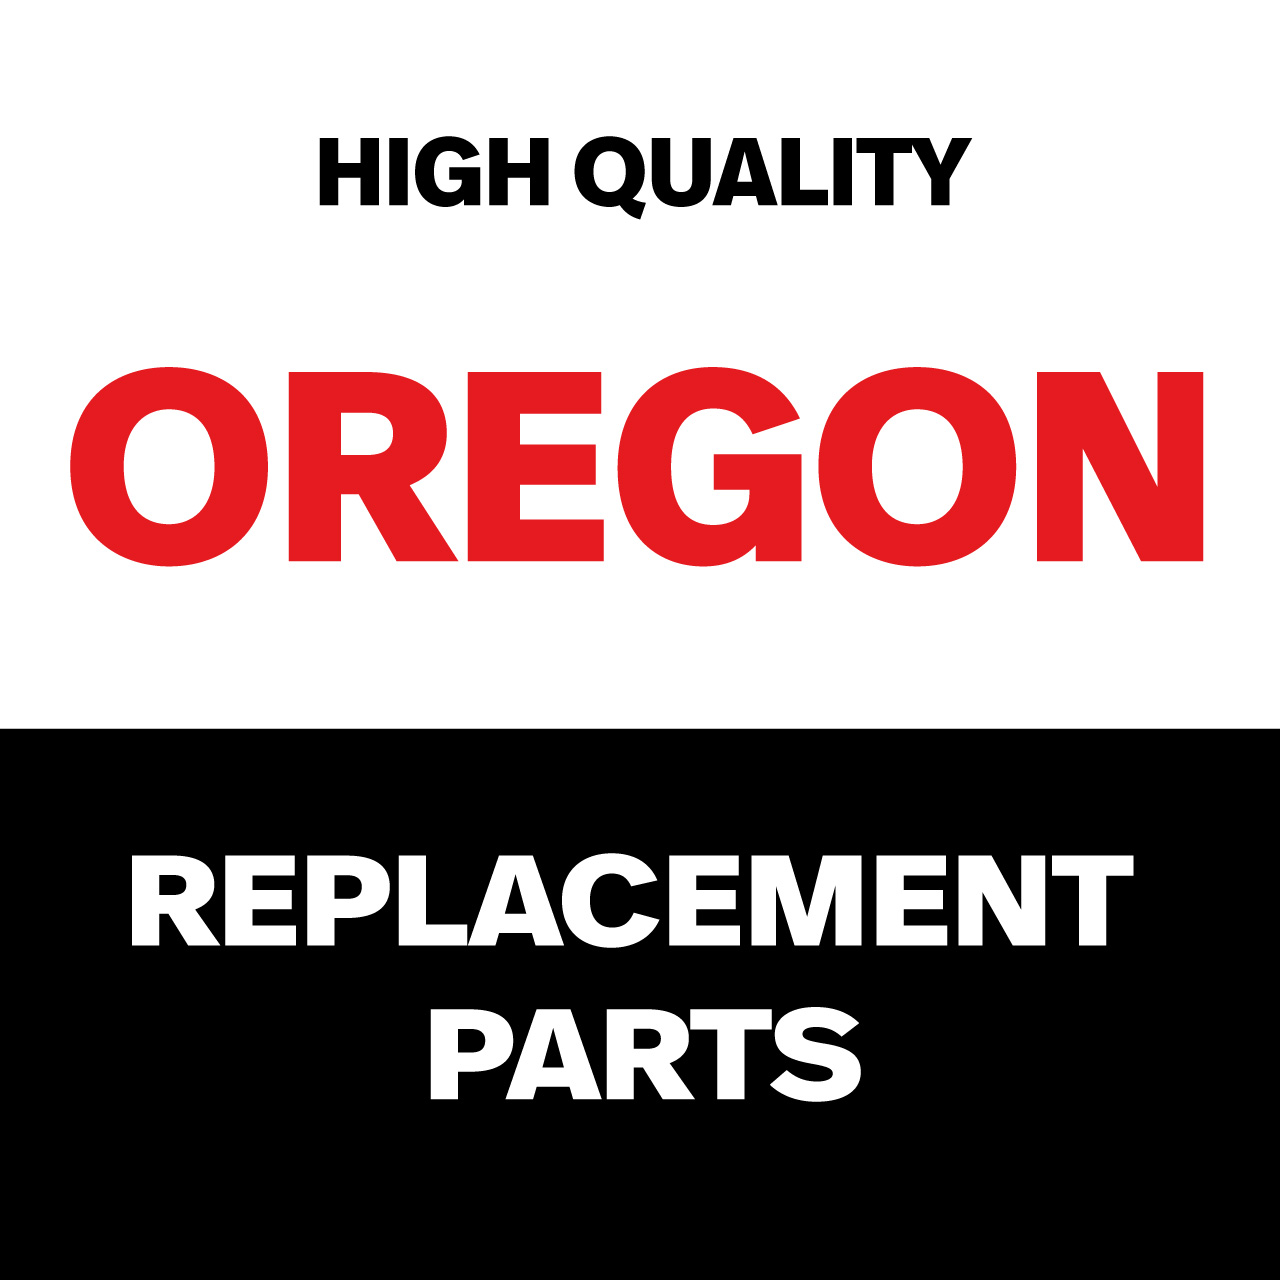 Oregon Shaft Spindle Assembly Husqvar 85-035 Genuine Replacement Part